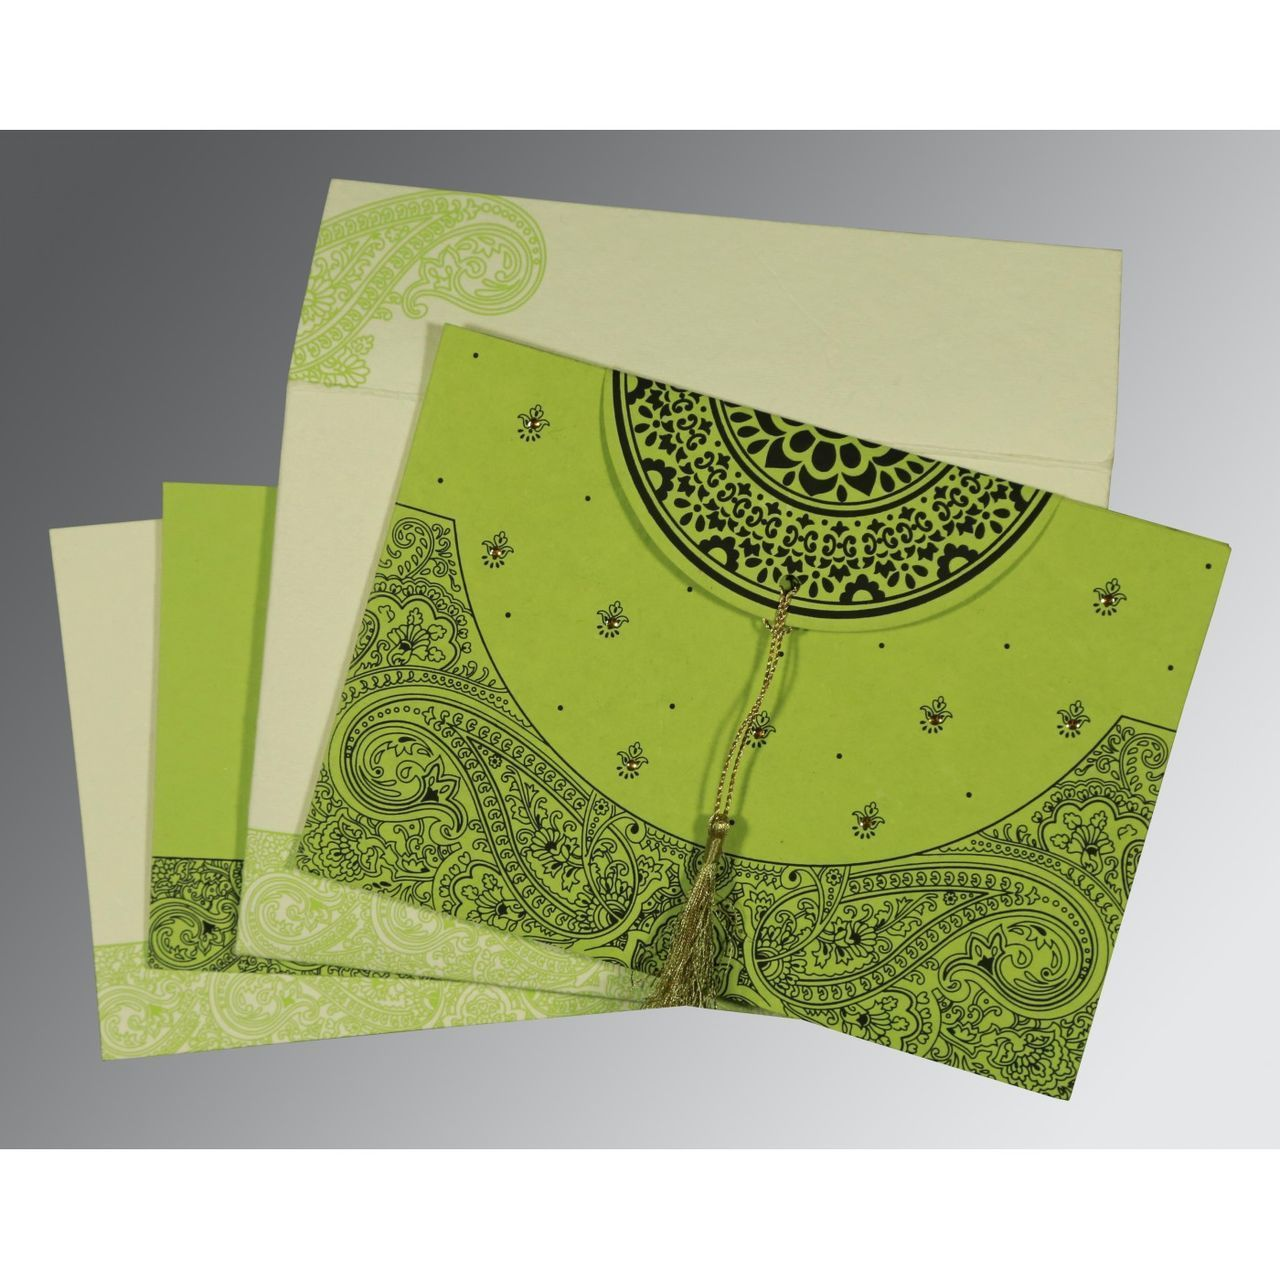 Islamic Wedding Invitations Cards Islamic Wedding Invitations Muslim Wedding Invites Muslim Wedding Cards Muslim Wedding Invitations